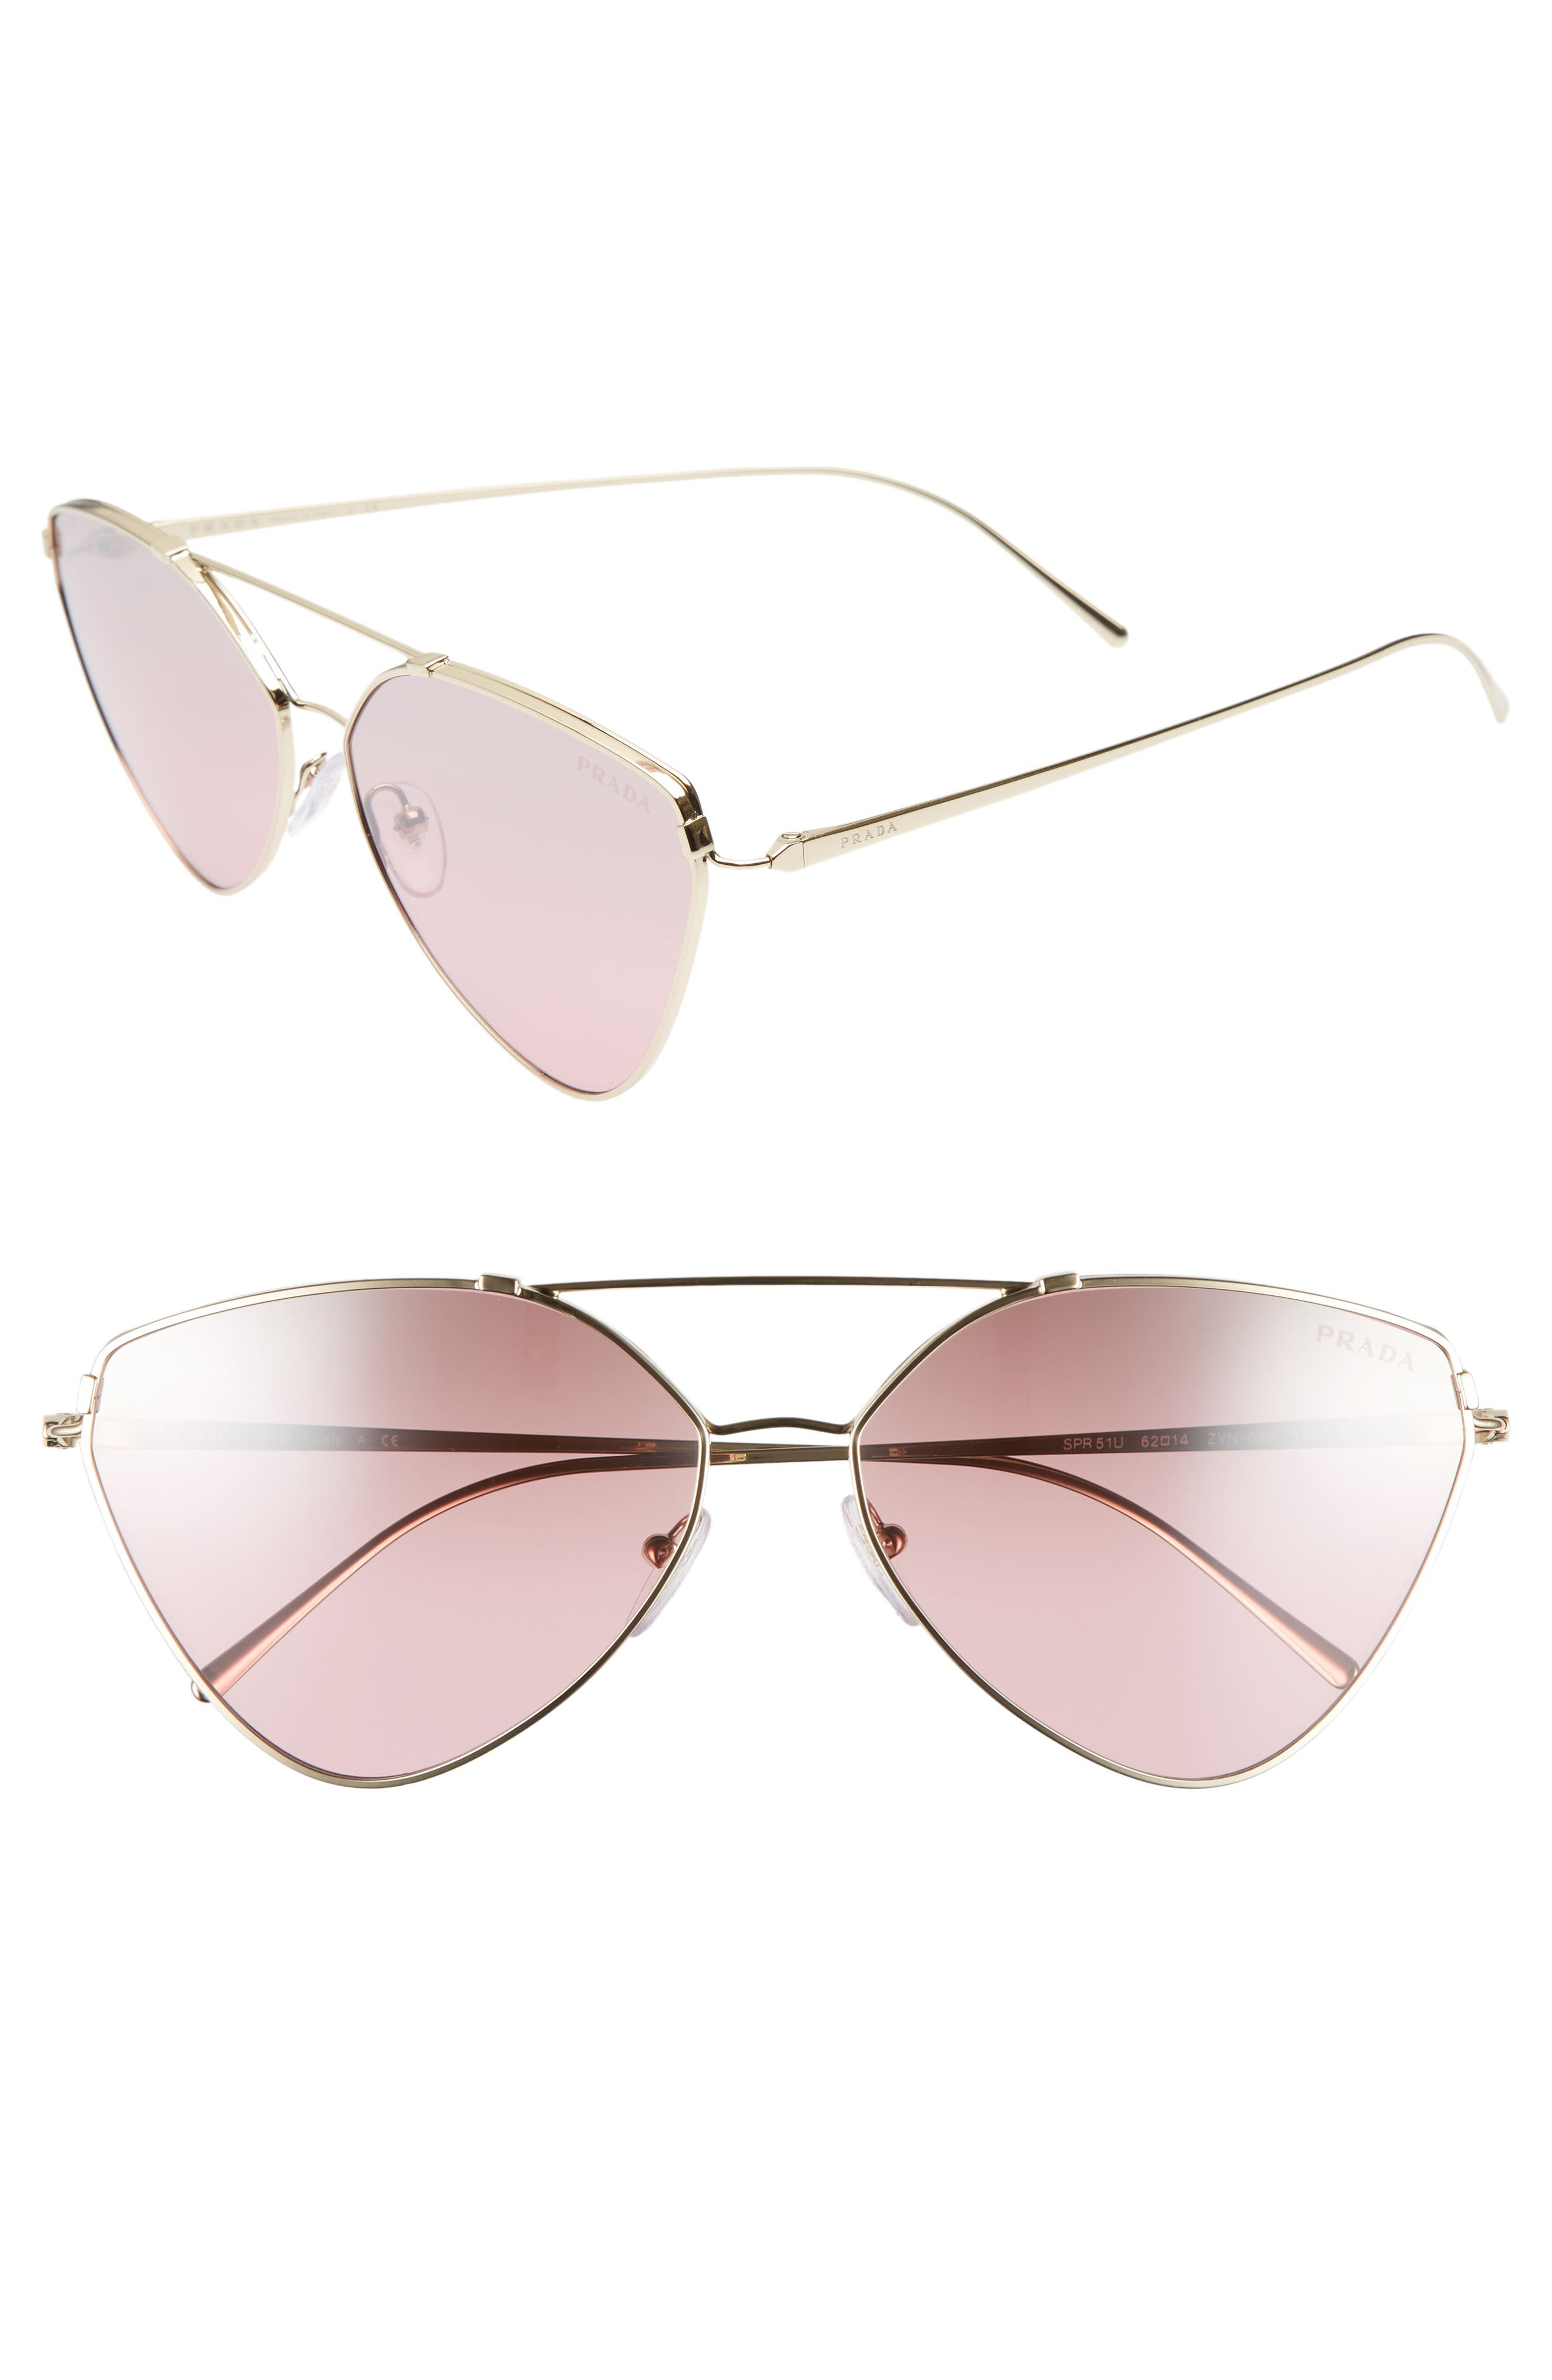 62mm Gradient Aviator Sunglasses,                         Main,                         color, Pale Gold